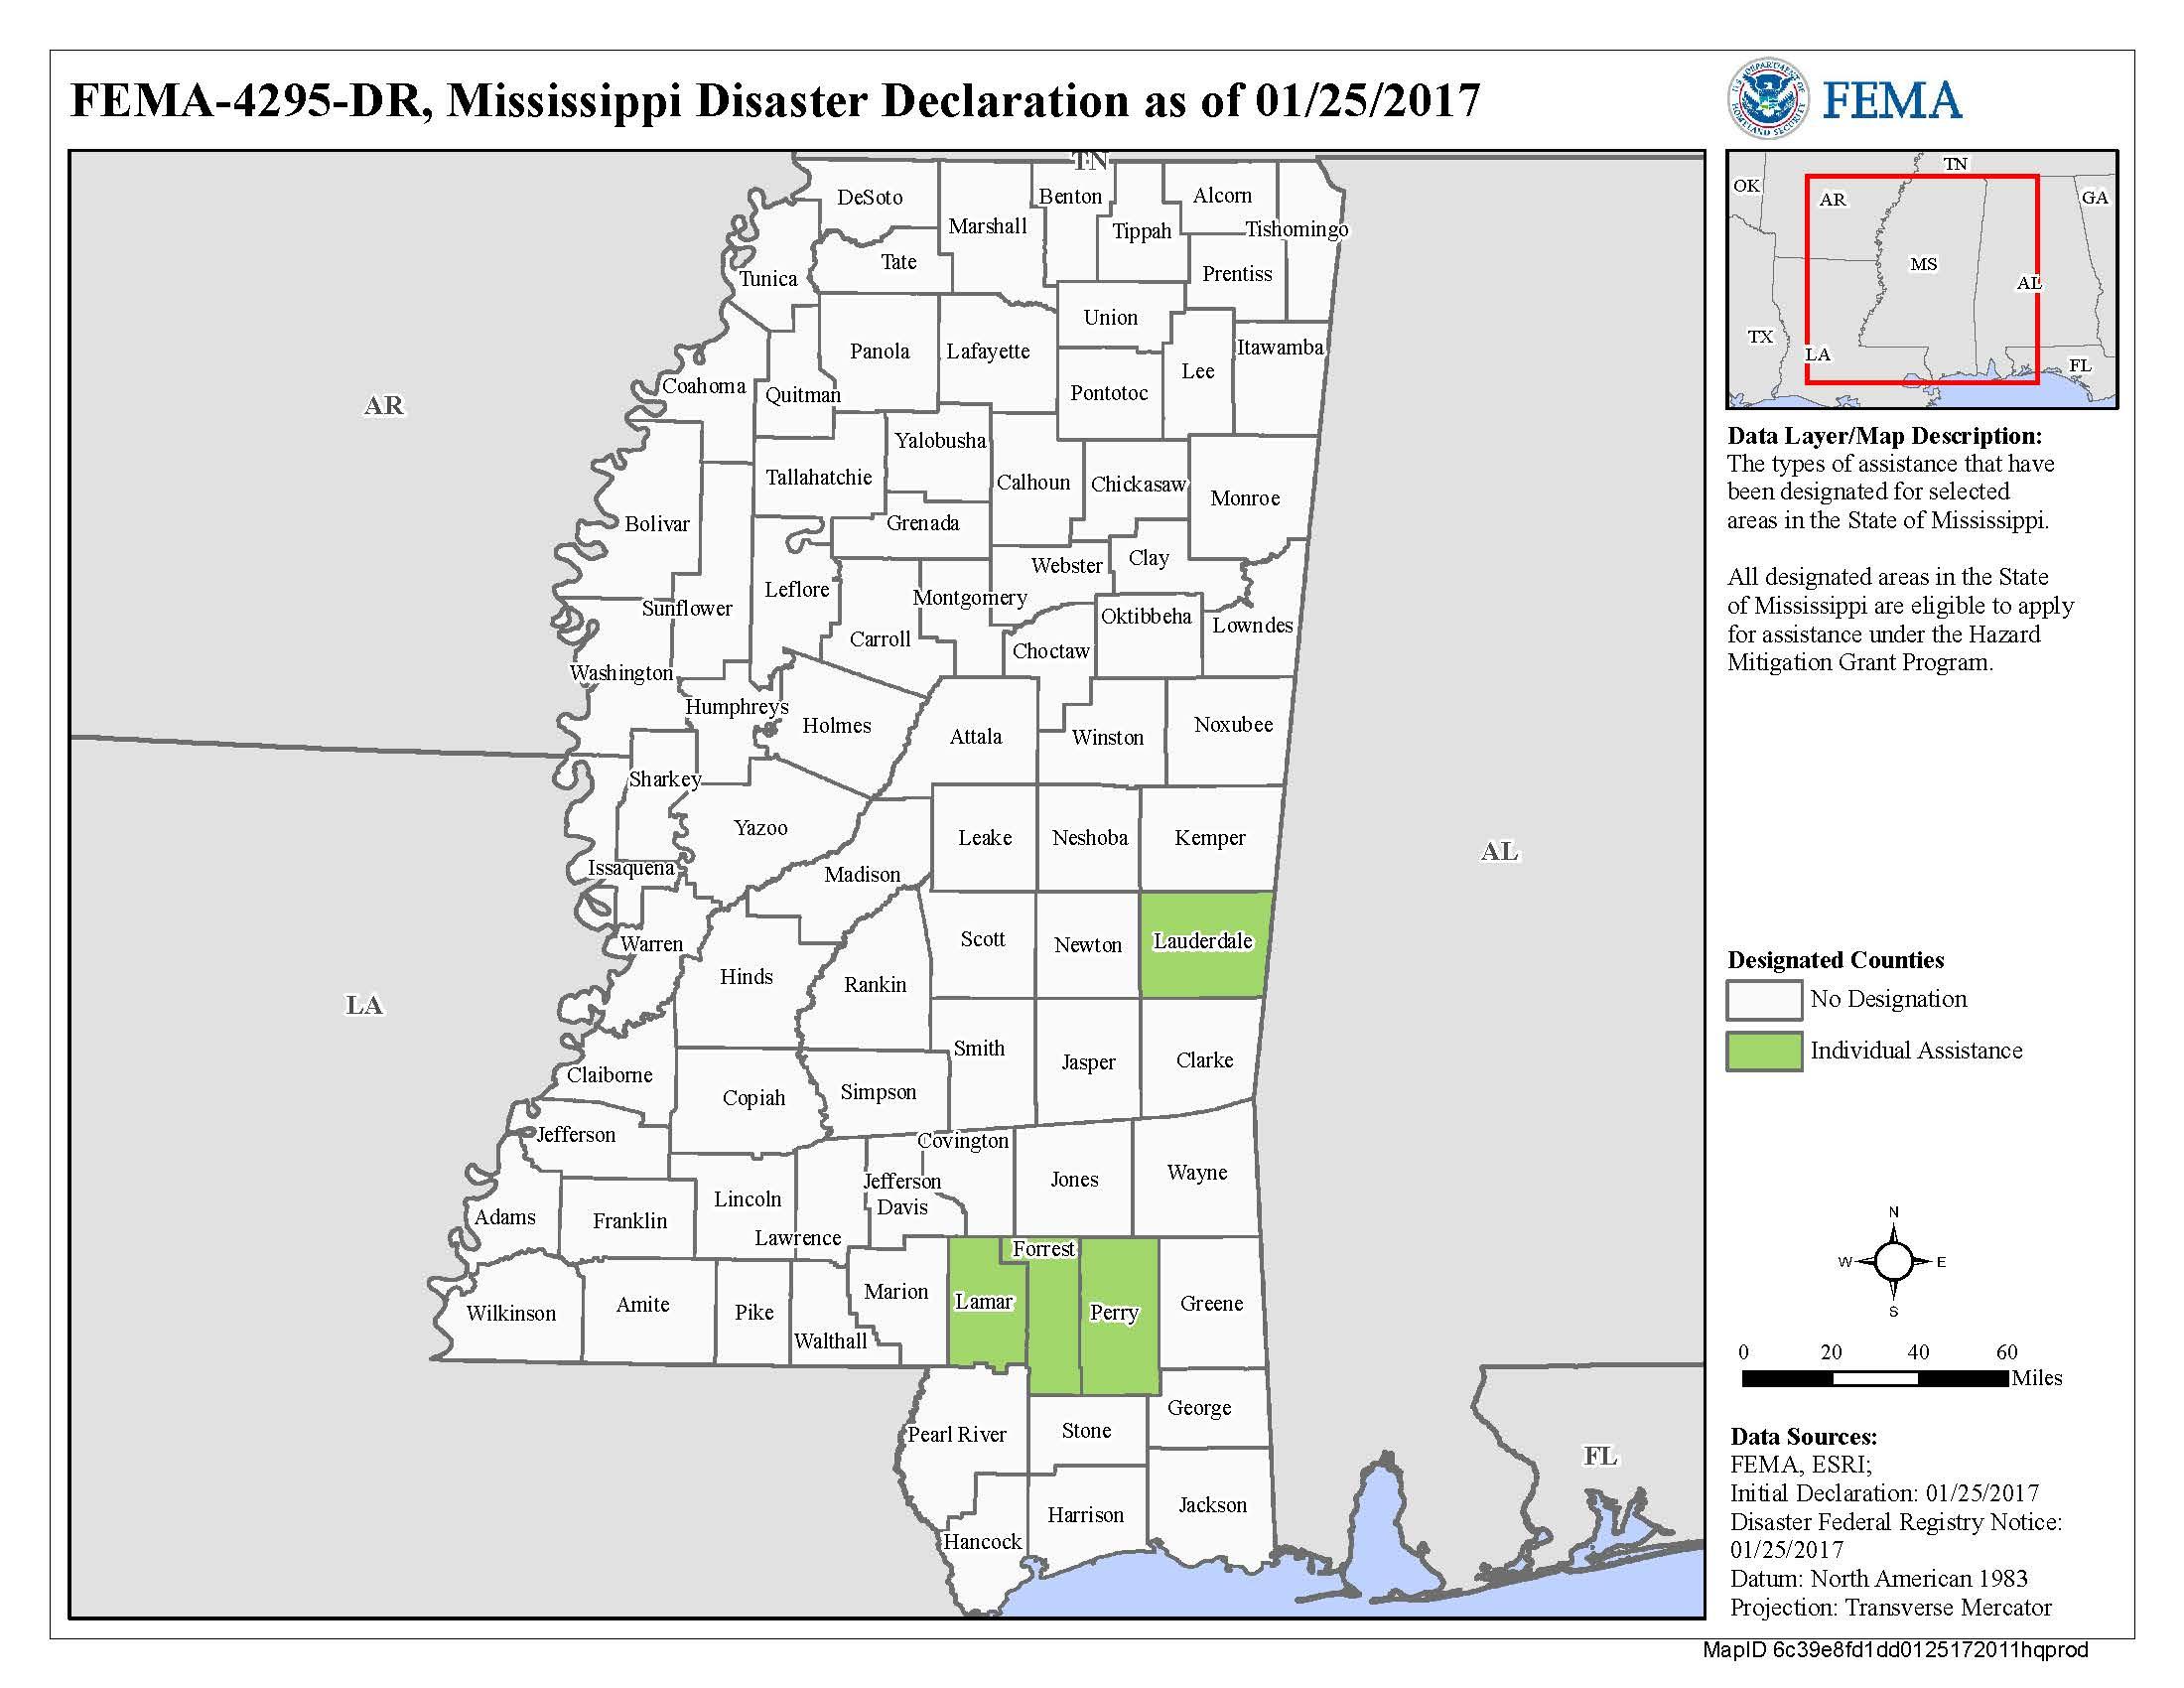 Disaster Map - Hattiesburg Area Development Partnership